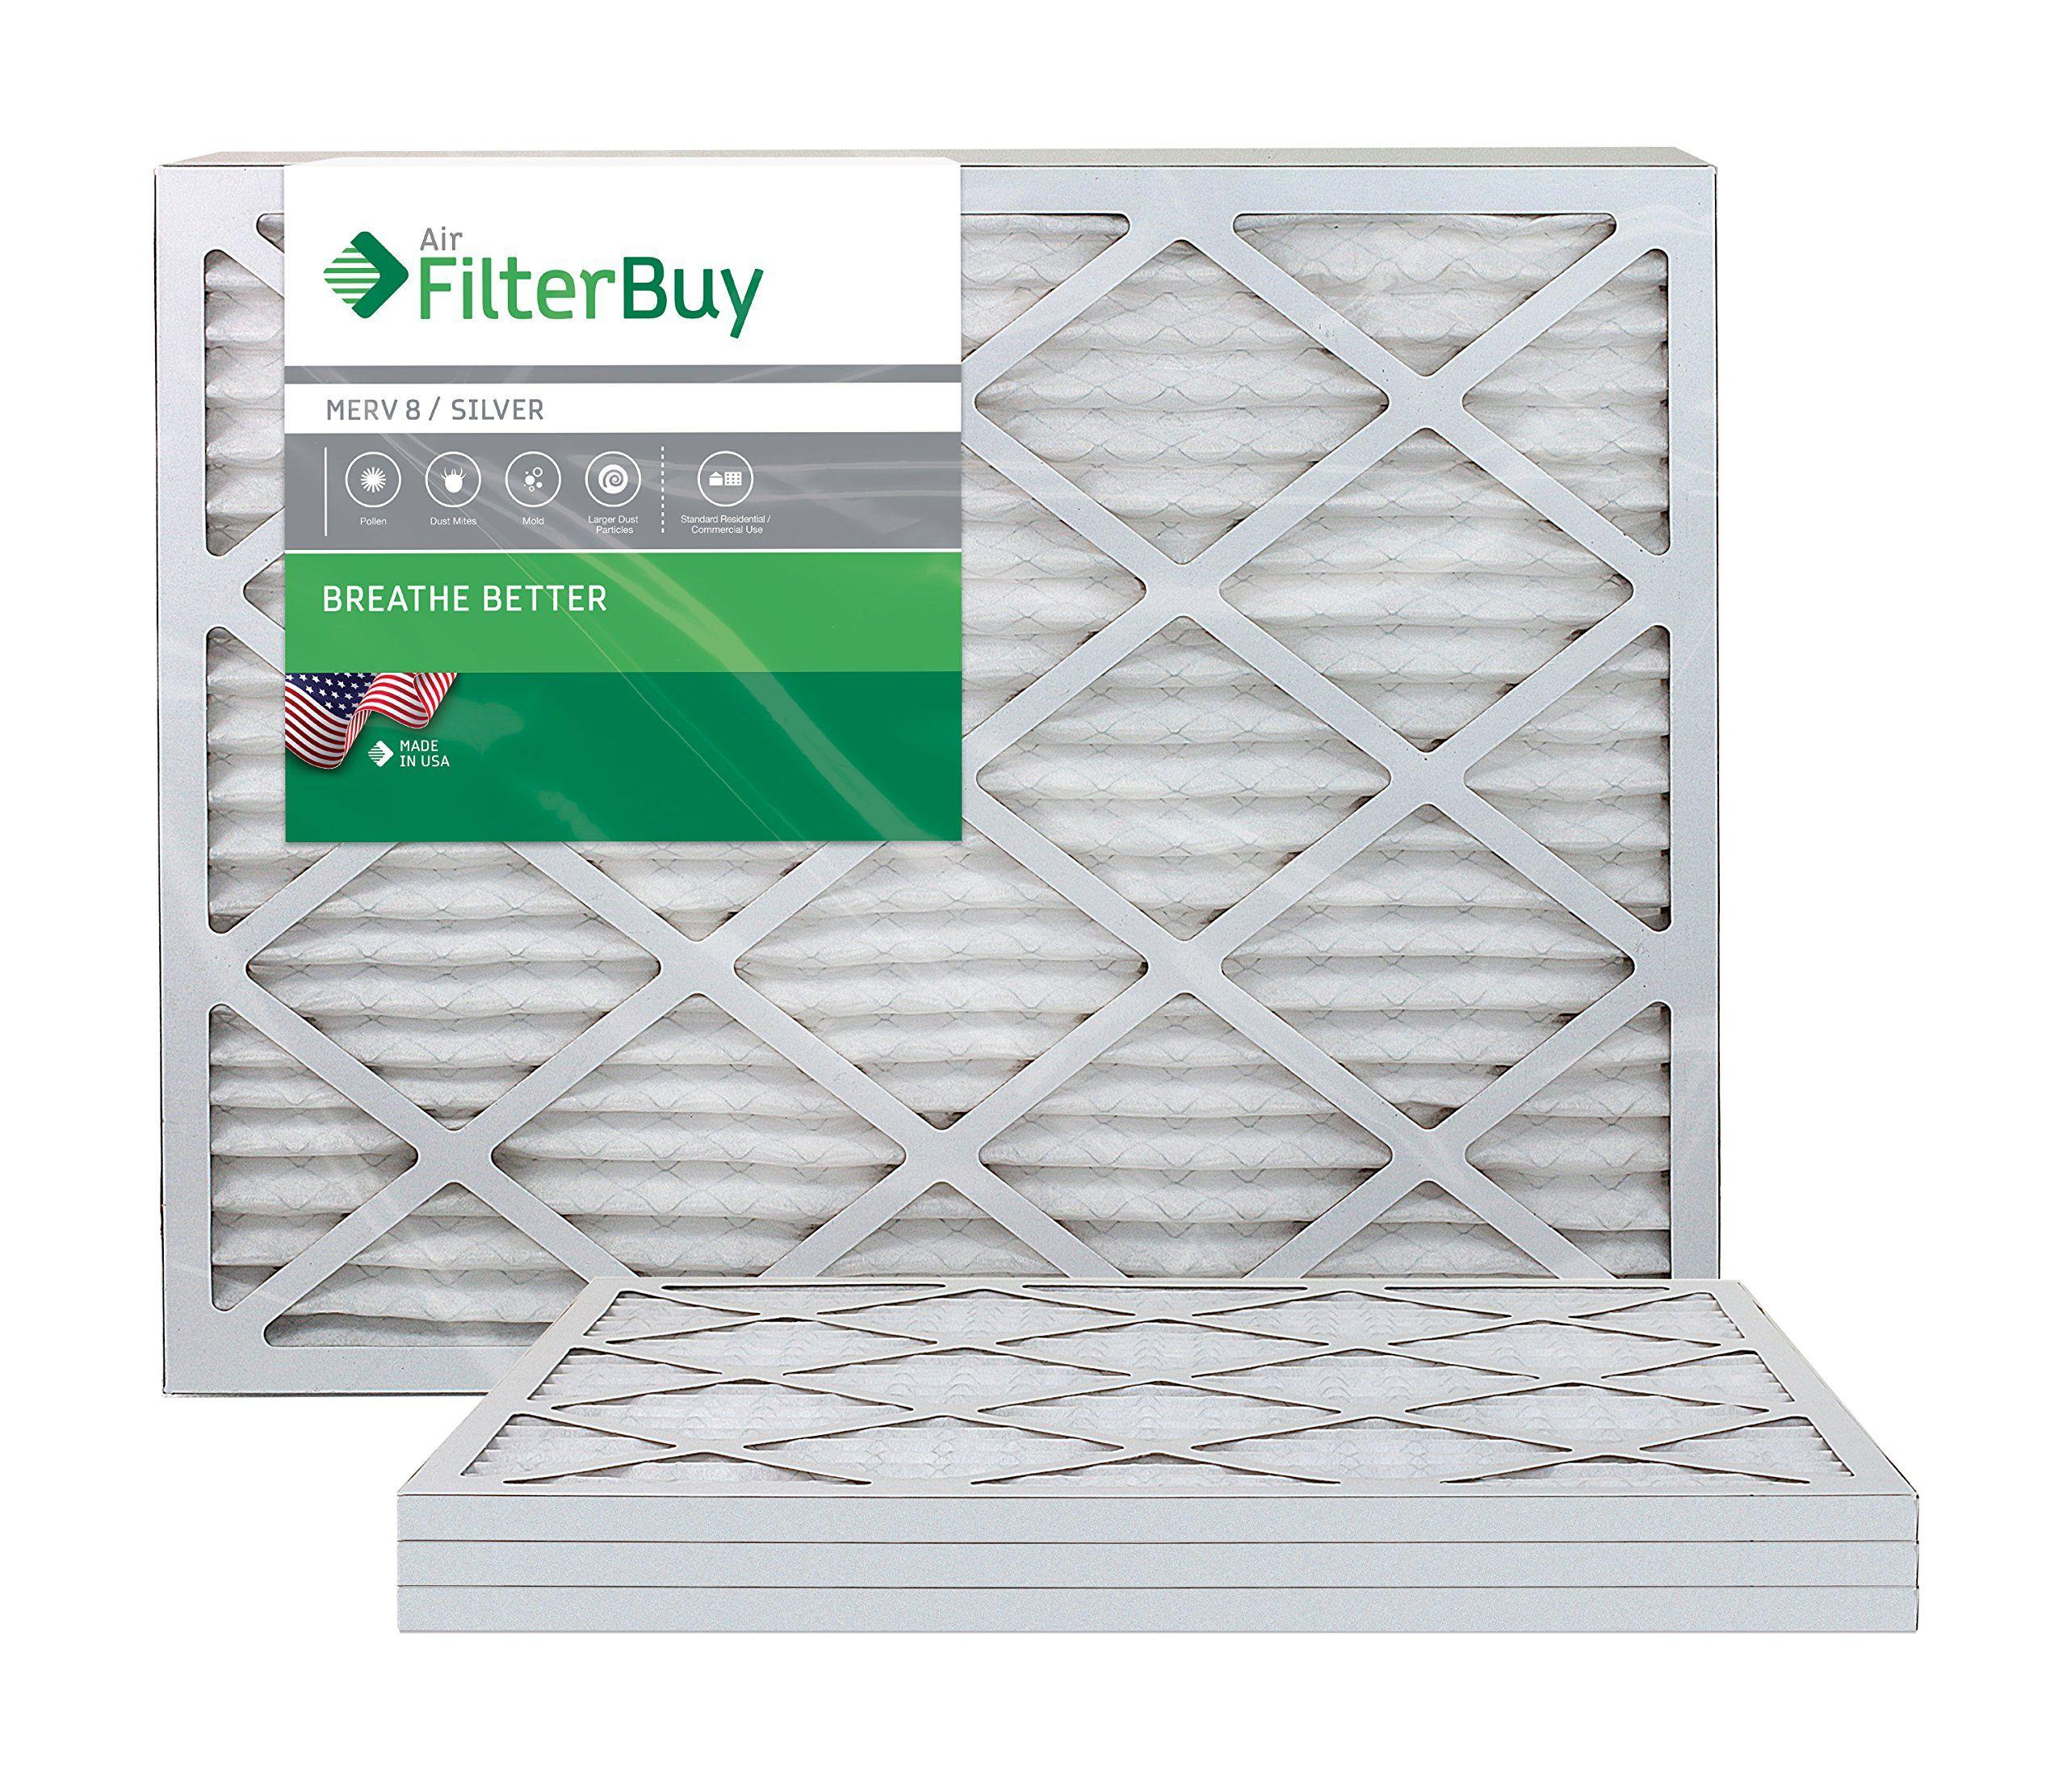 FilterBuy 24x24x1 MERV 8 Pleated AC Furnace Air Filter